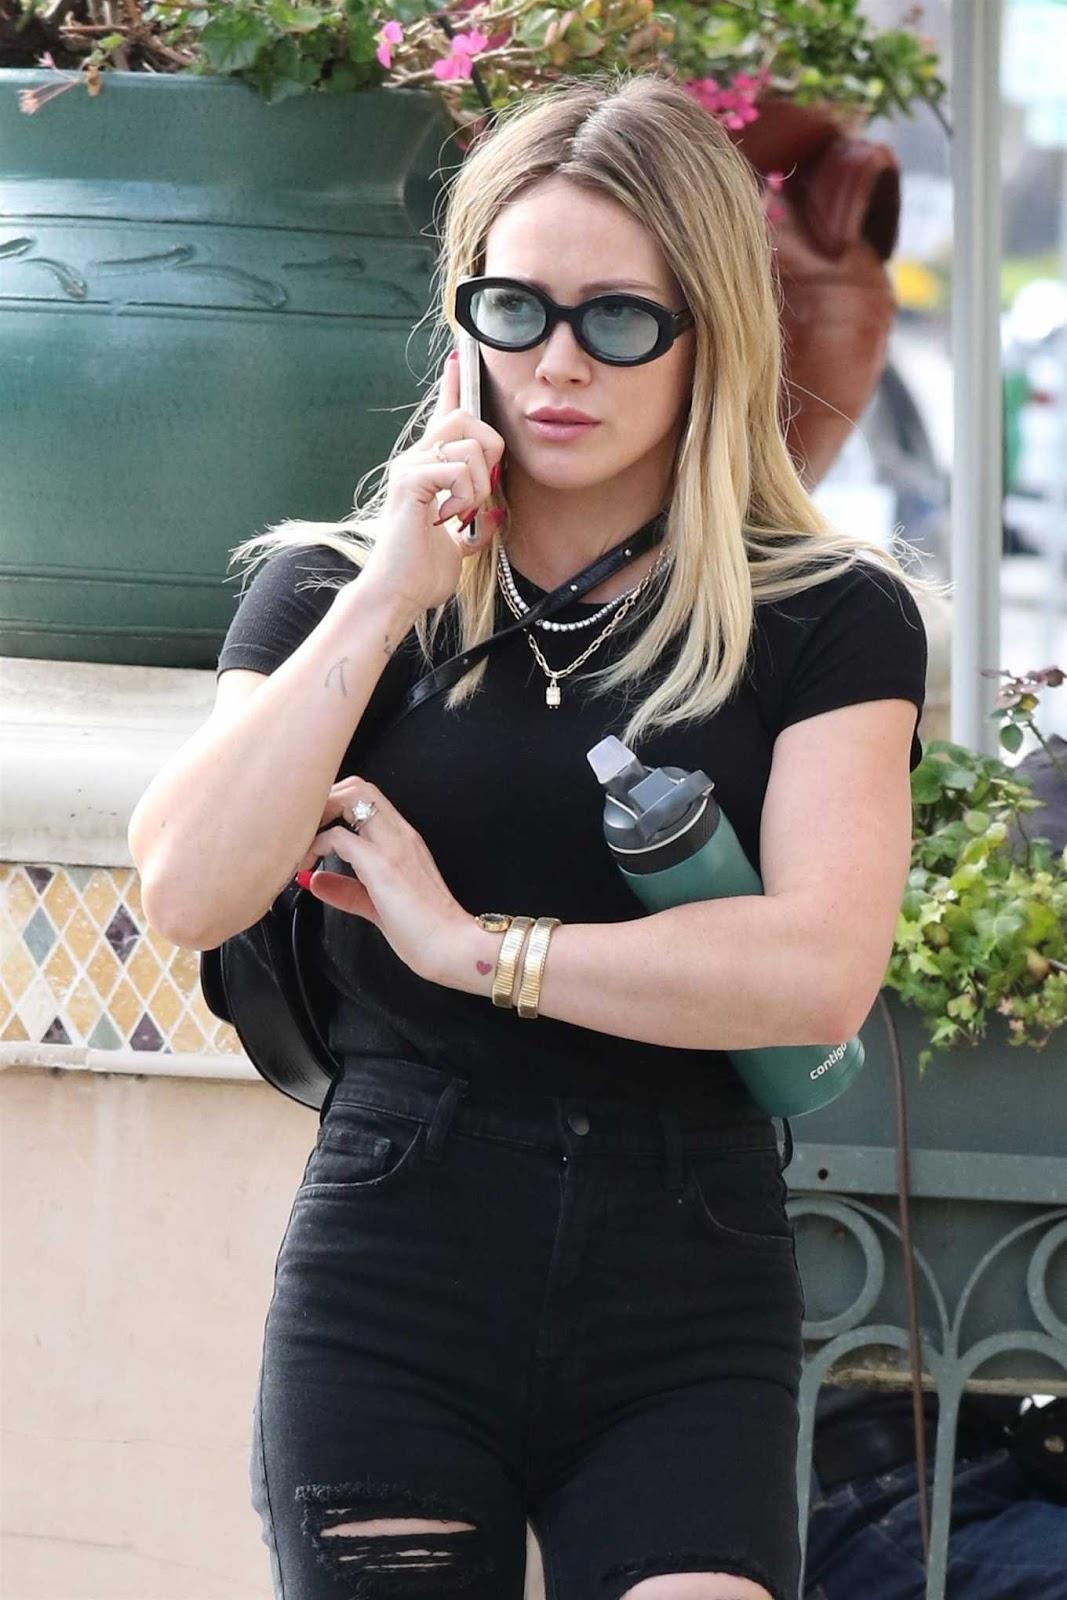 Hilary Duff Looks Hot in Black Jeans